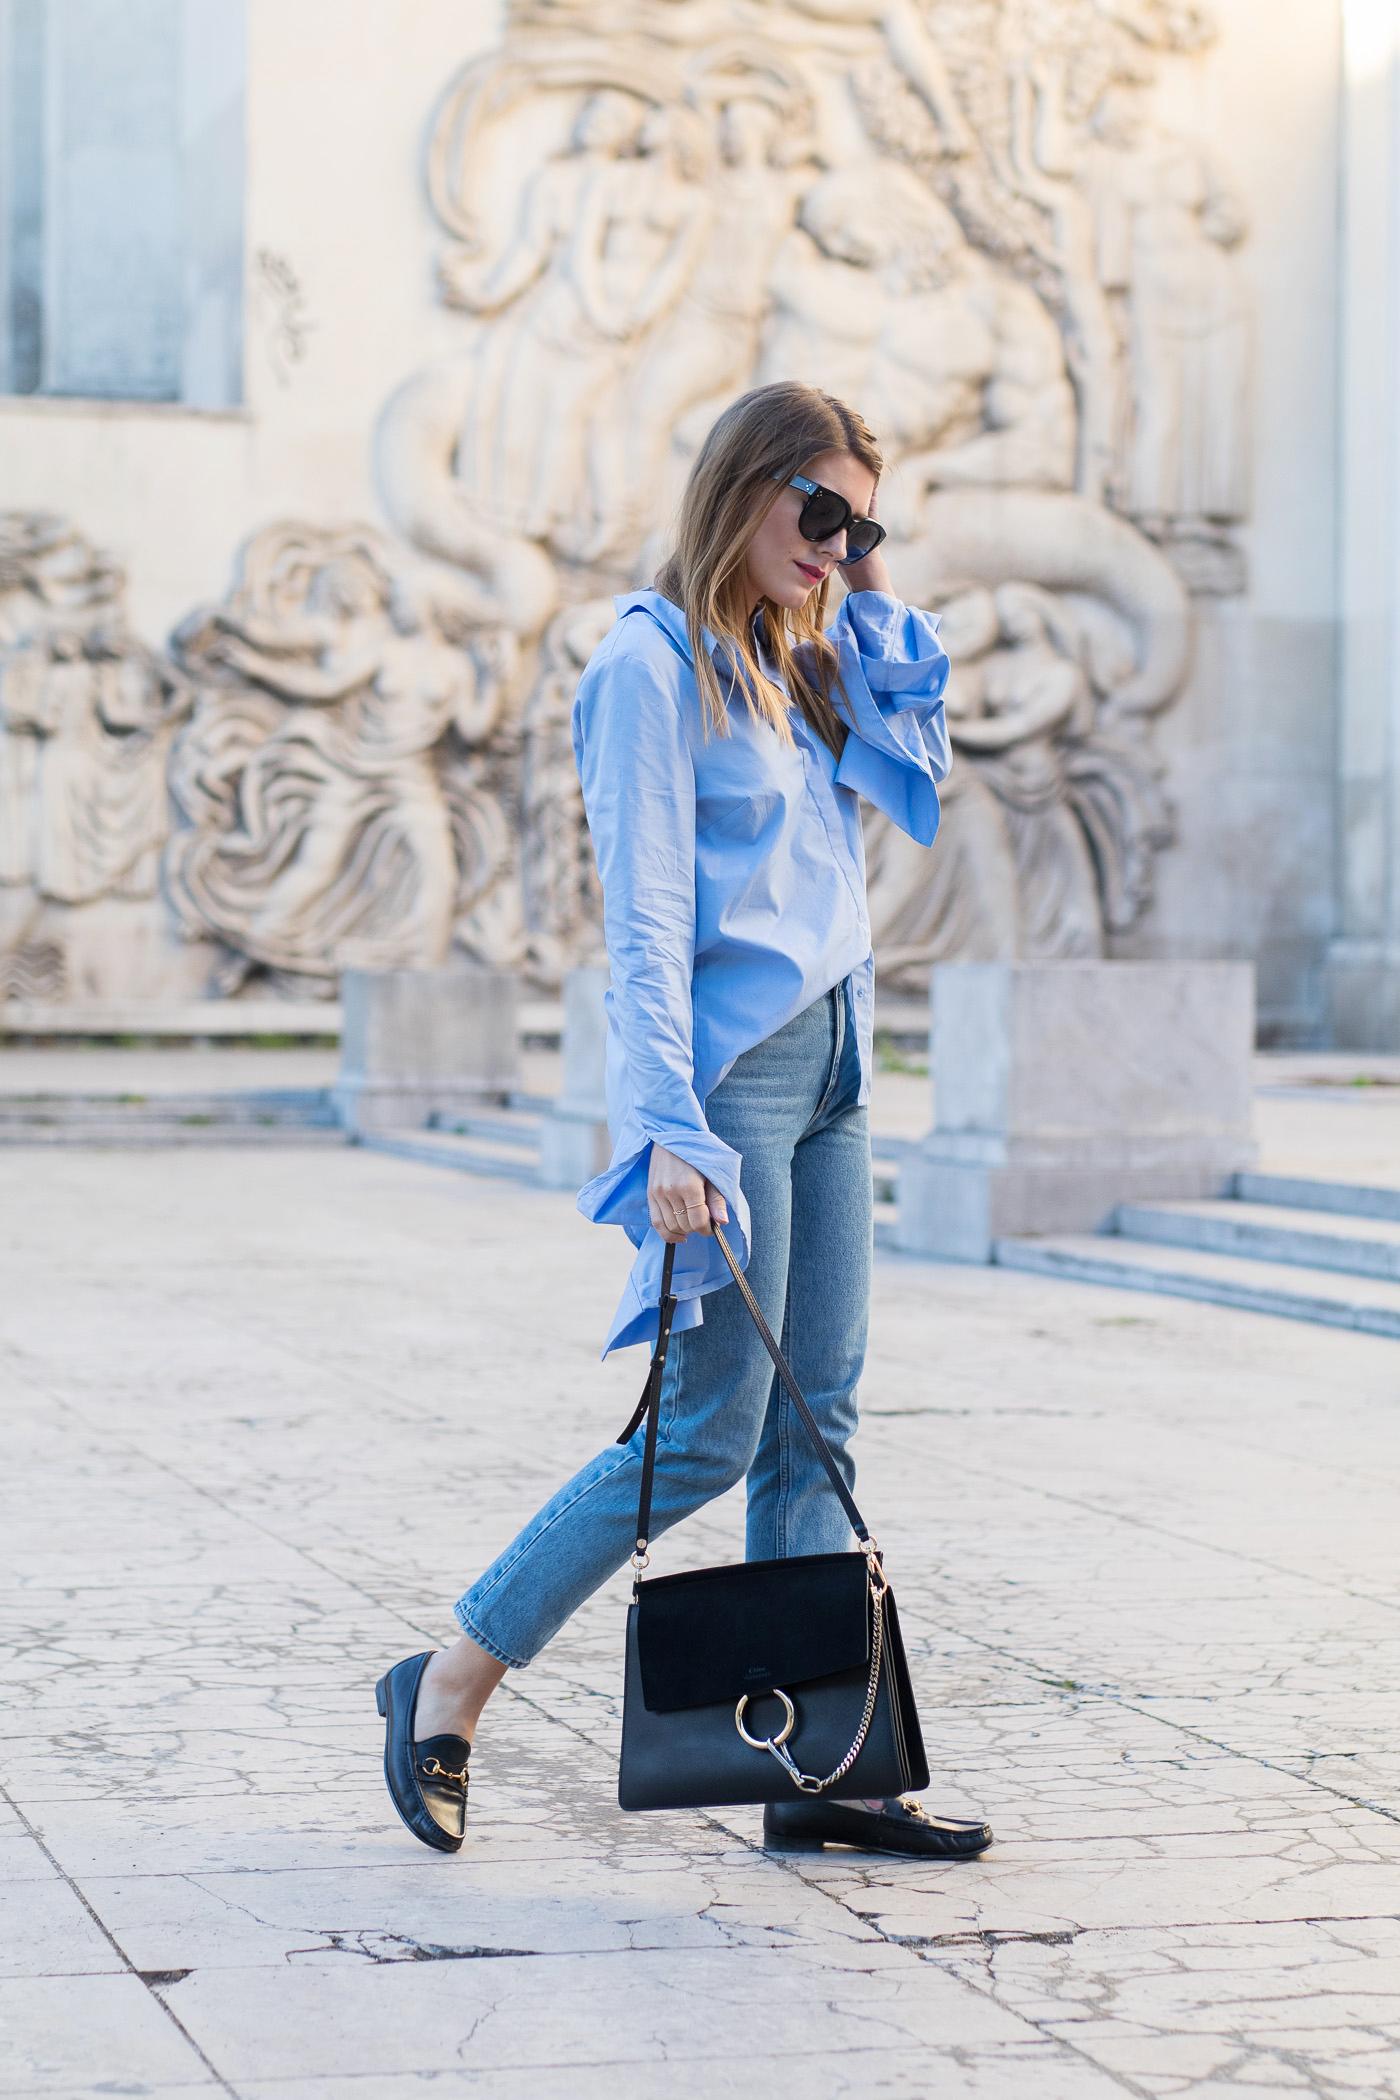 paris_casual_business_look_3